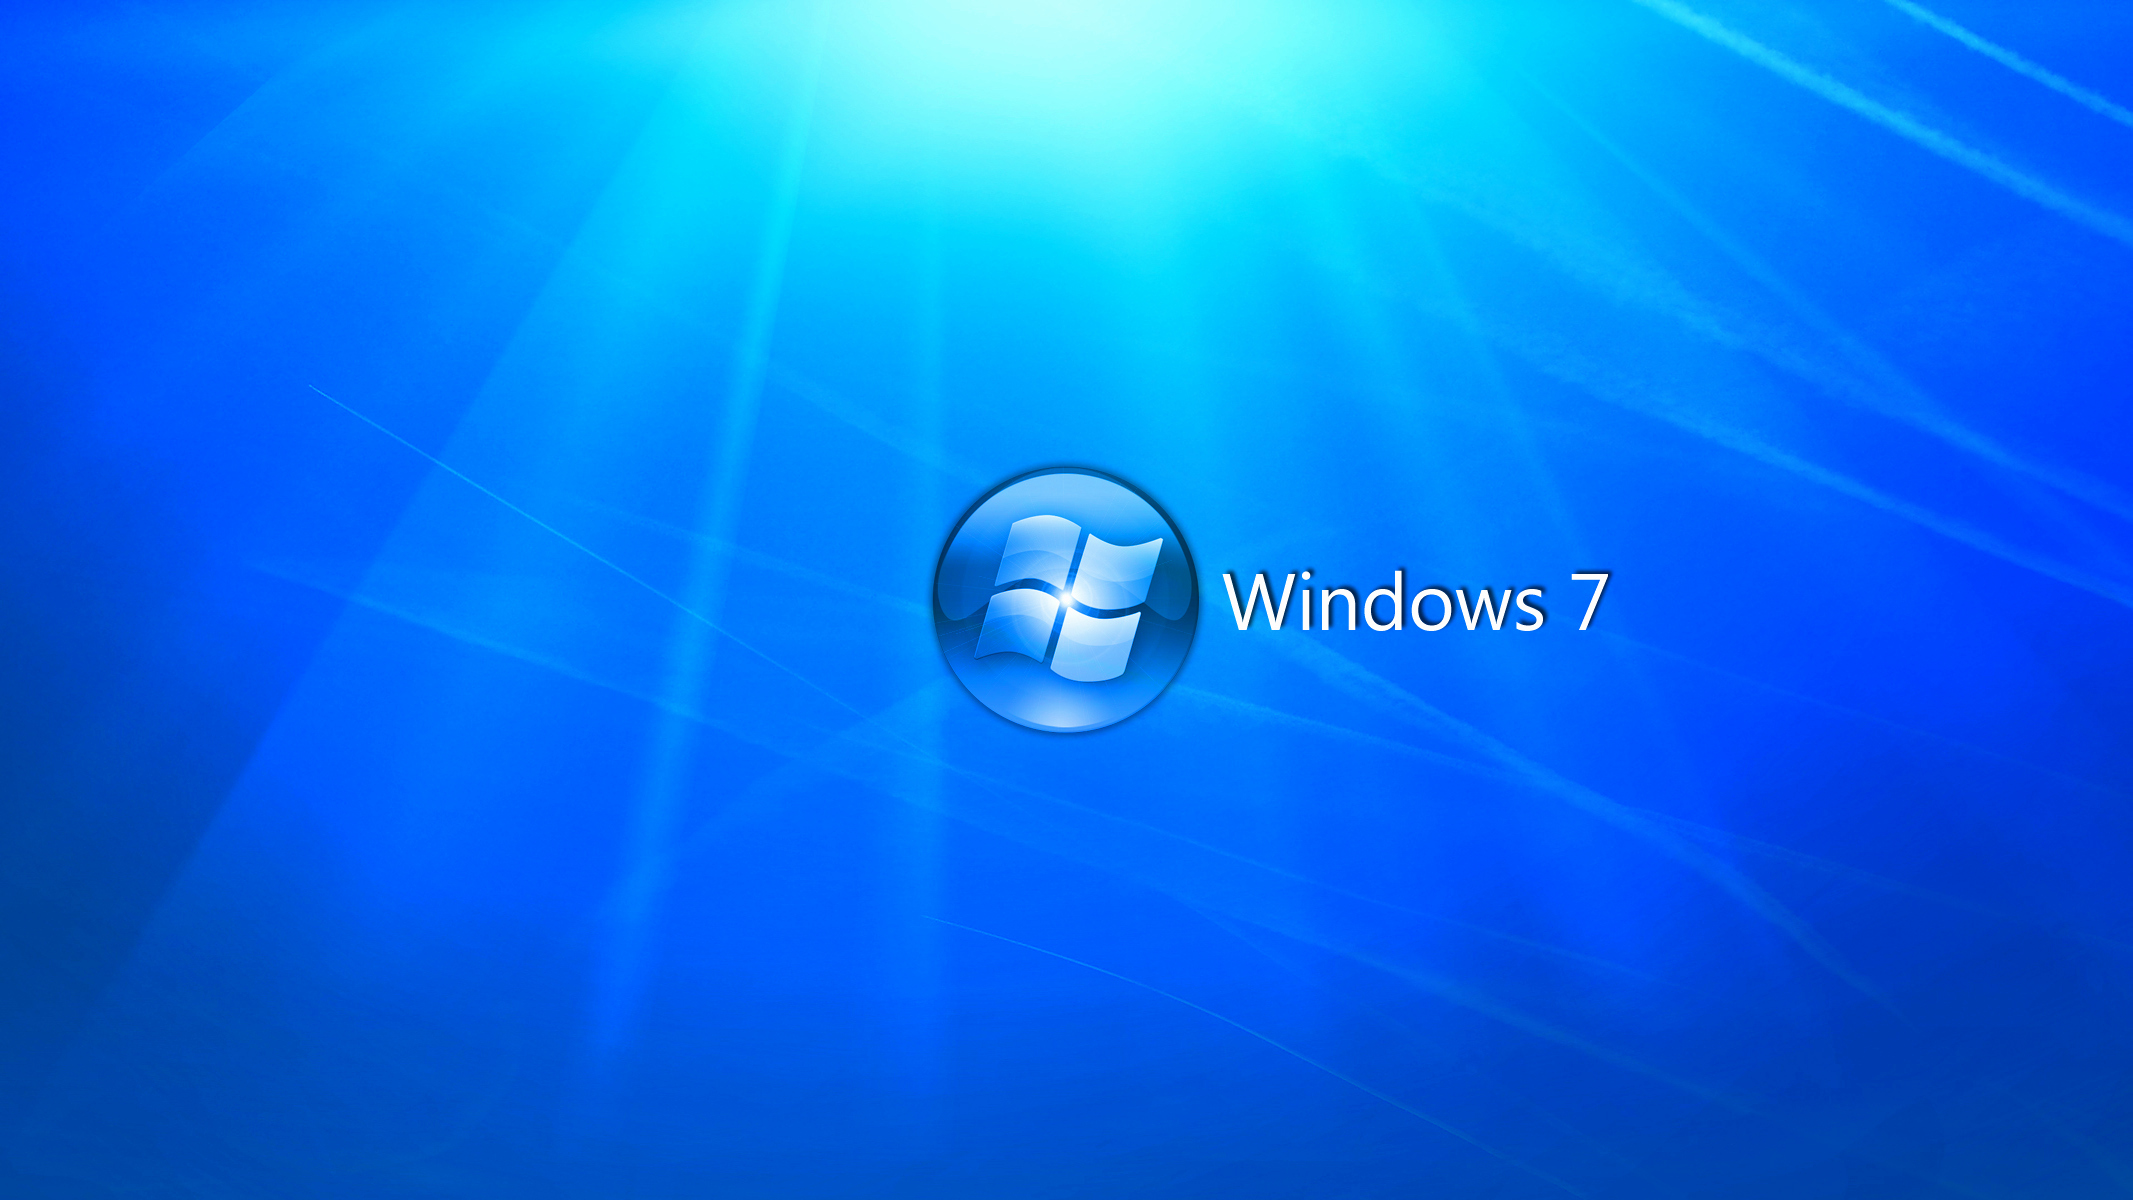 Blue Photoshop Background Elegant Desktop Backgrounds   Windows 7 2133x1200